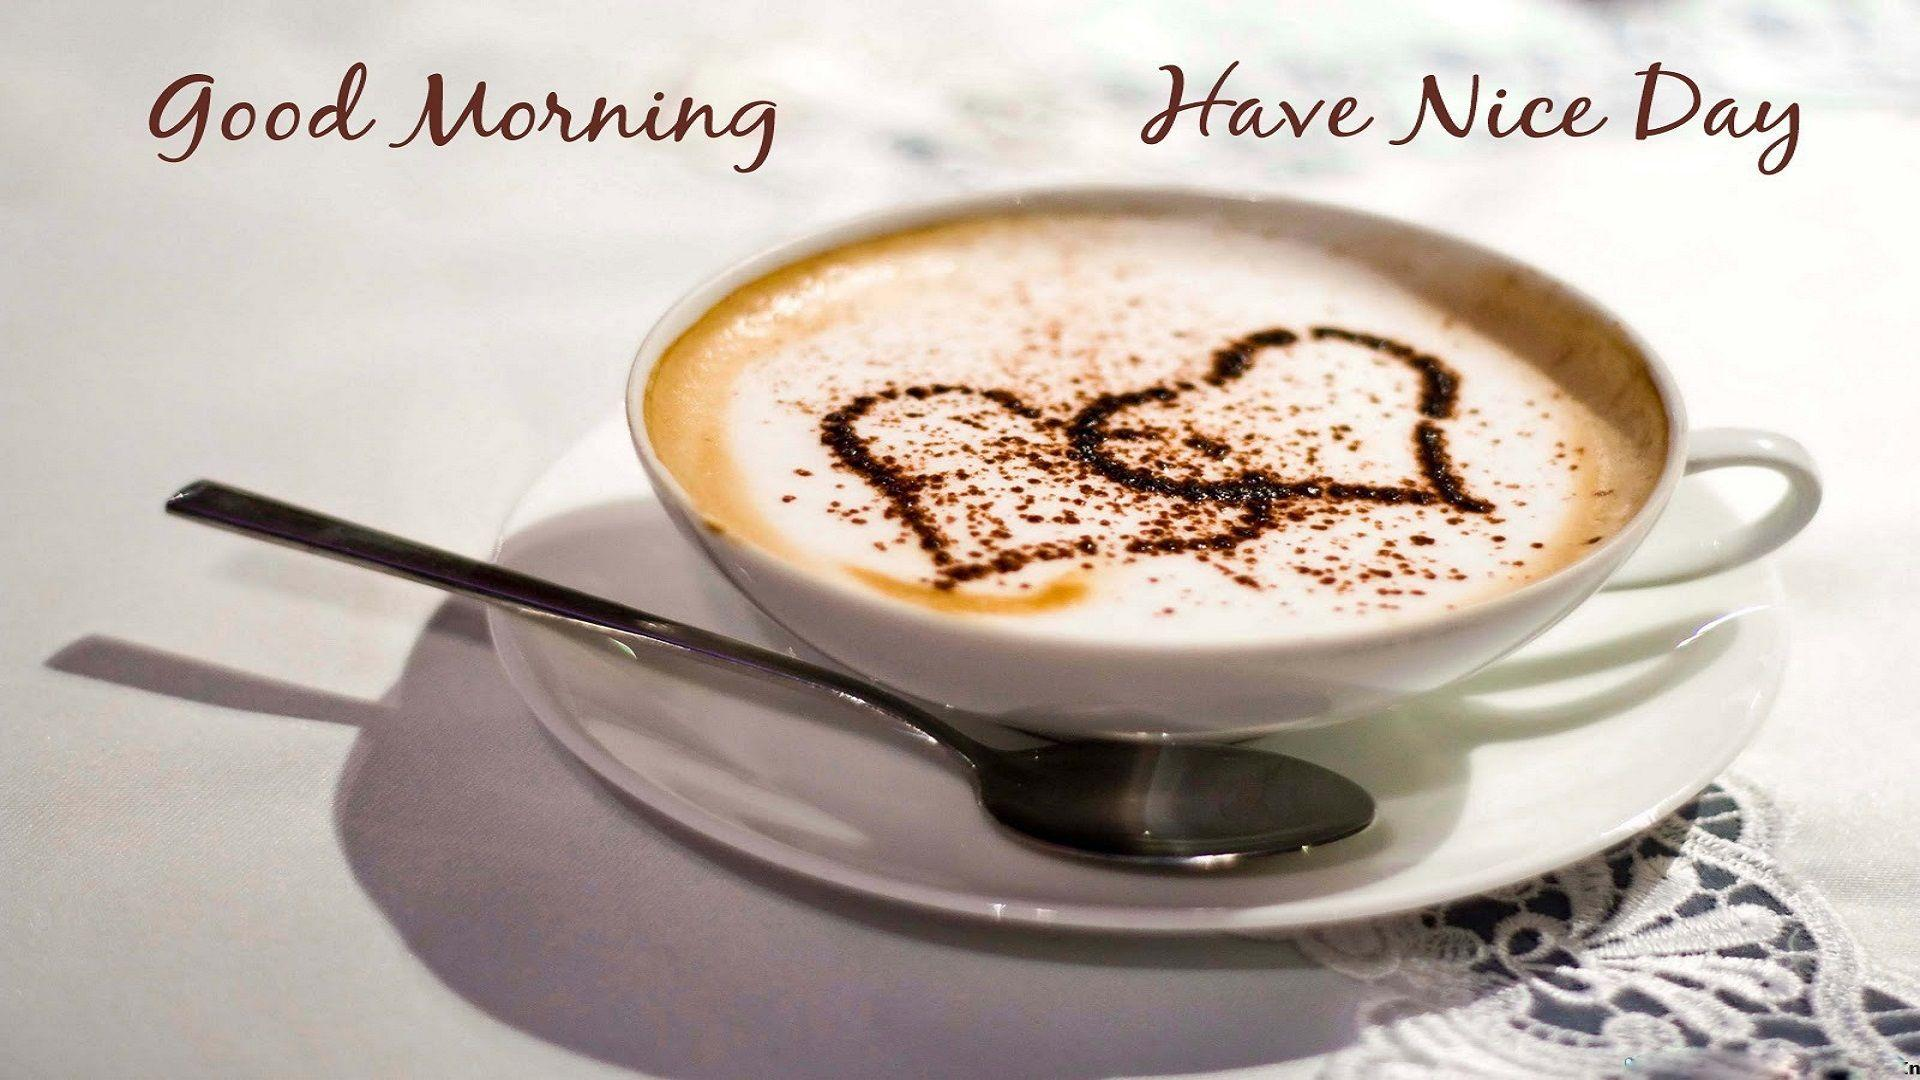 Good Morning Wallpapers Hd Wallpaper Cave